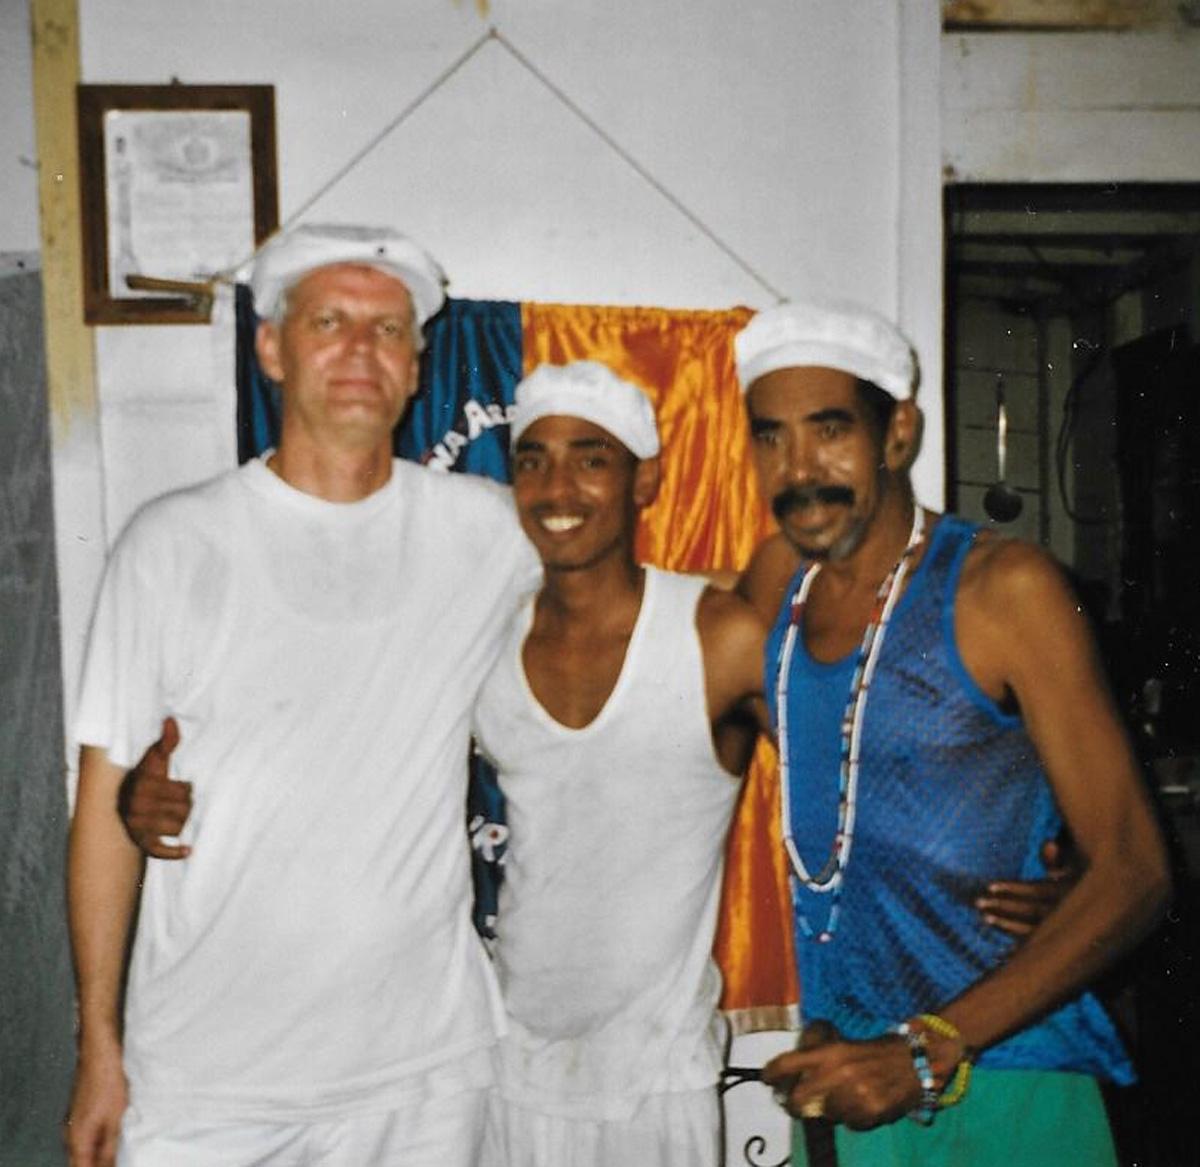 "After Thomas's juramento in Añá in 2005, together with his padrino in Añá, Lázaro Jean Kessell Moliner ""El Fimba"" and the dueño of the tambor of Adofó in Regla, Lázaro Sanabria Calderón, known as ""Papaíto"" ©Thomas Altmann"